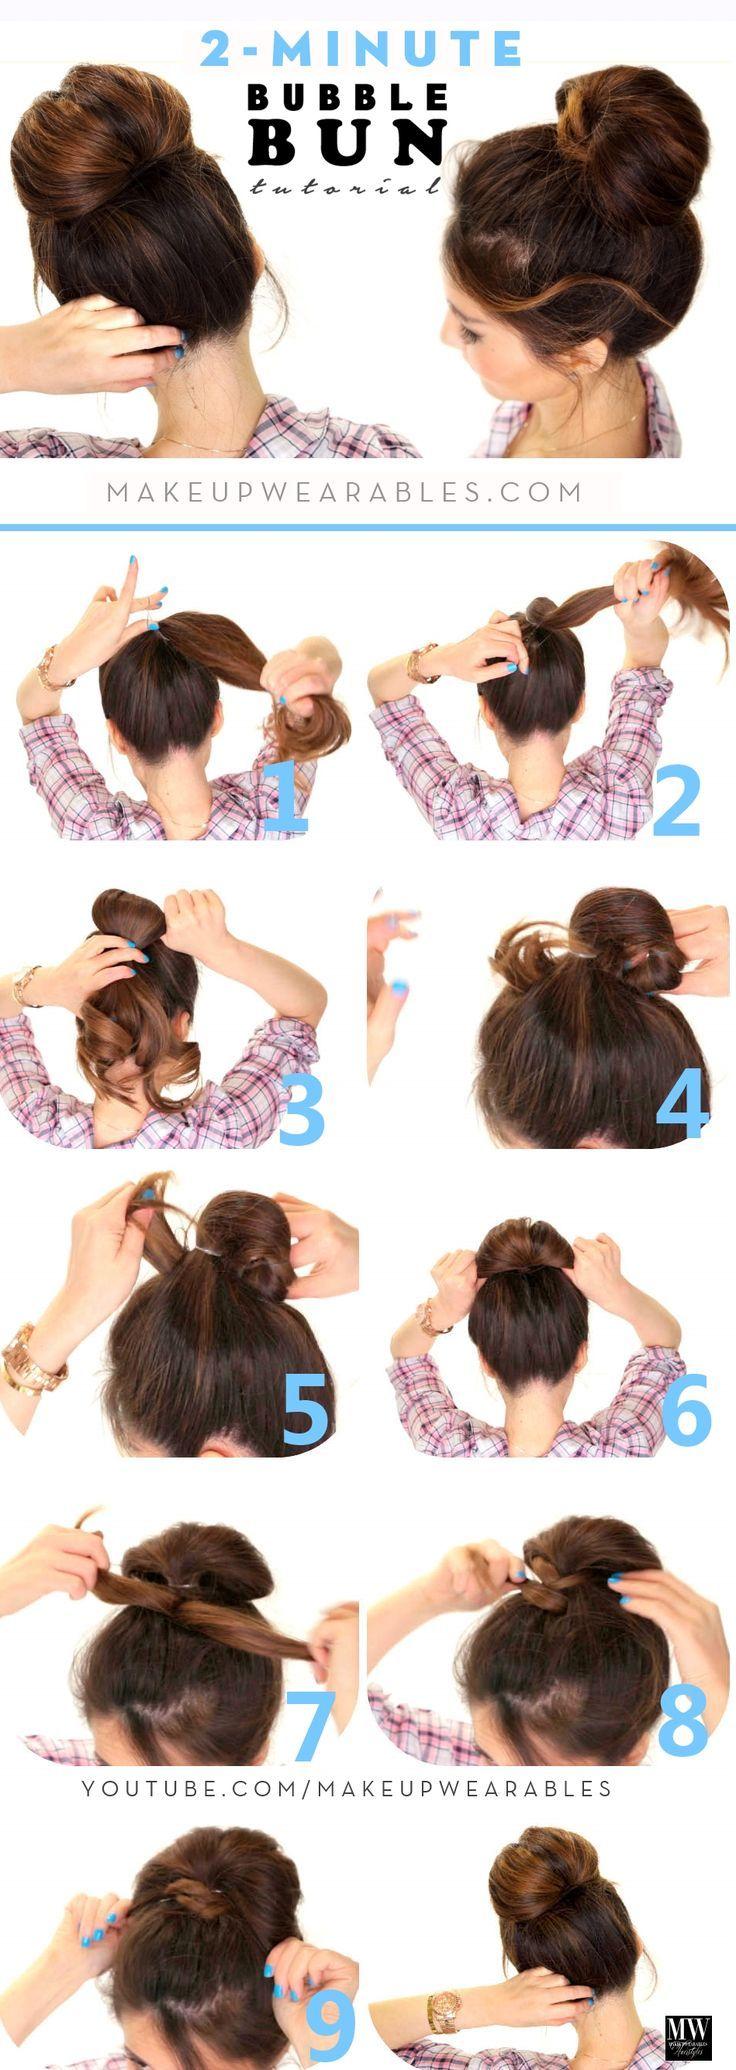 popular medium hairstyles for women shoulder length hair